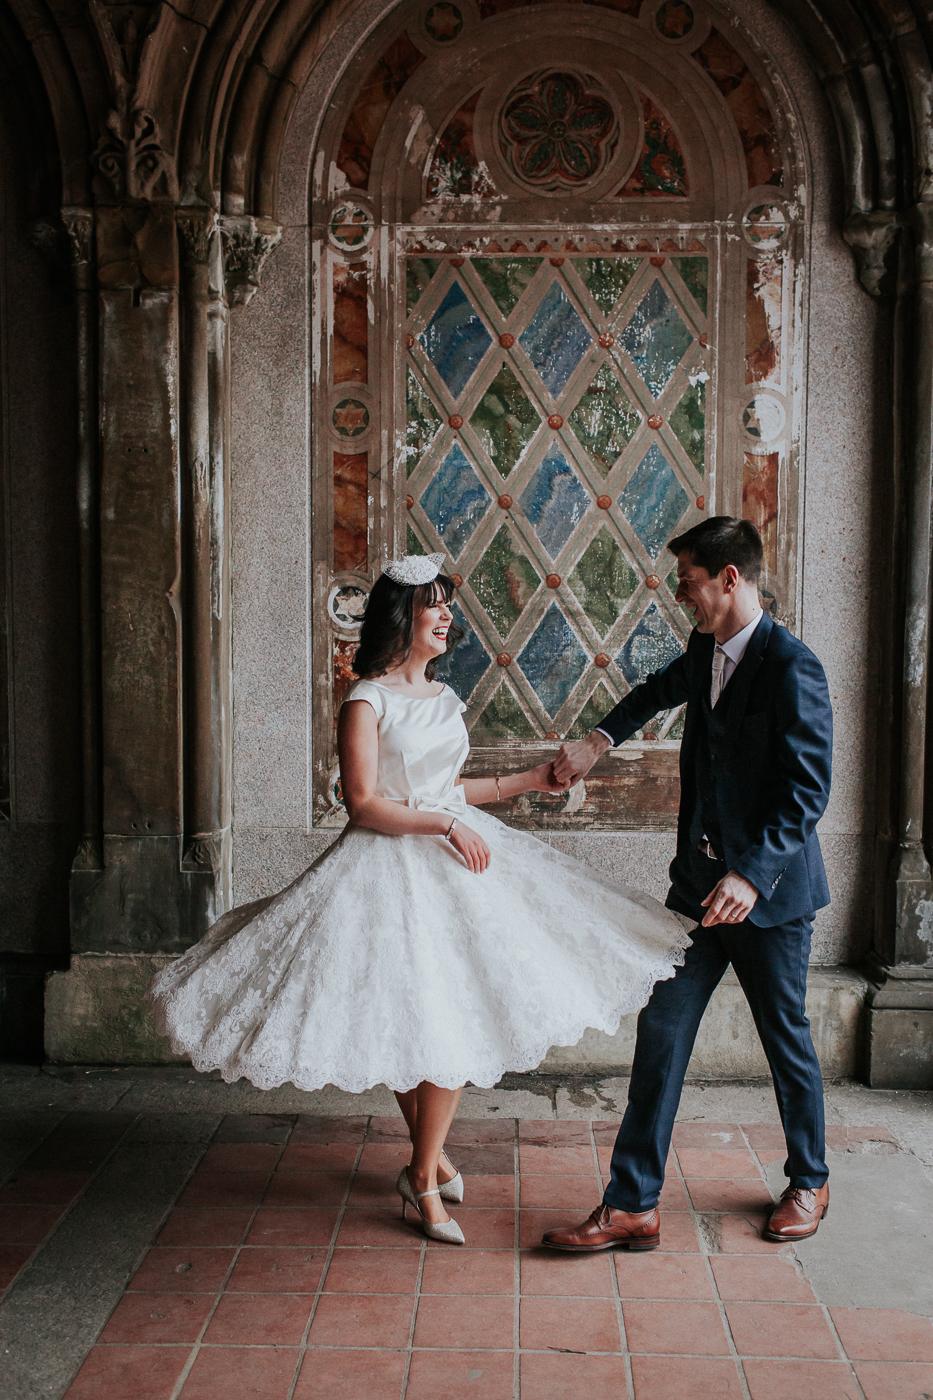 Ladies-Pavilion-Central-Park-NYC-Documentary-Elopement-Wedding-Photographer-60.jpg